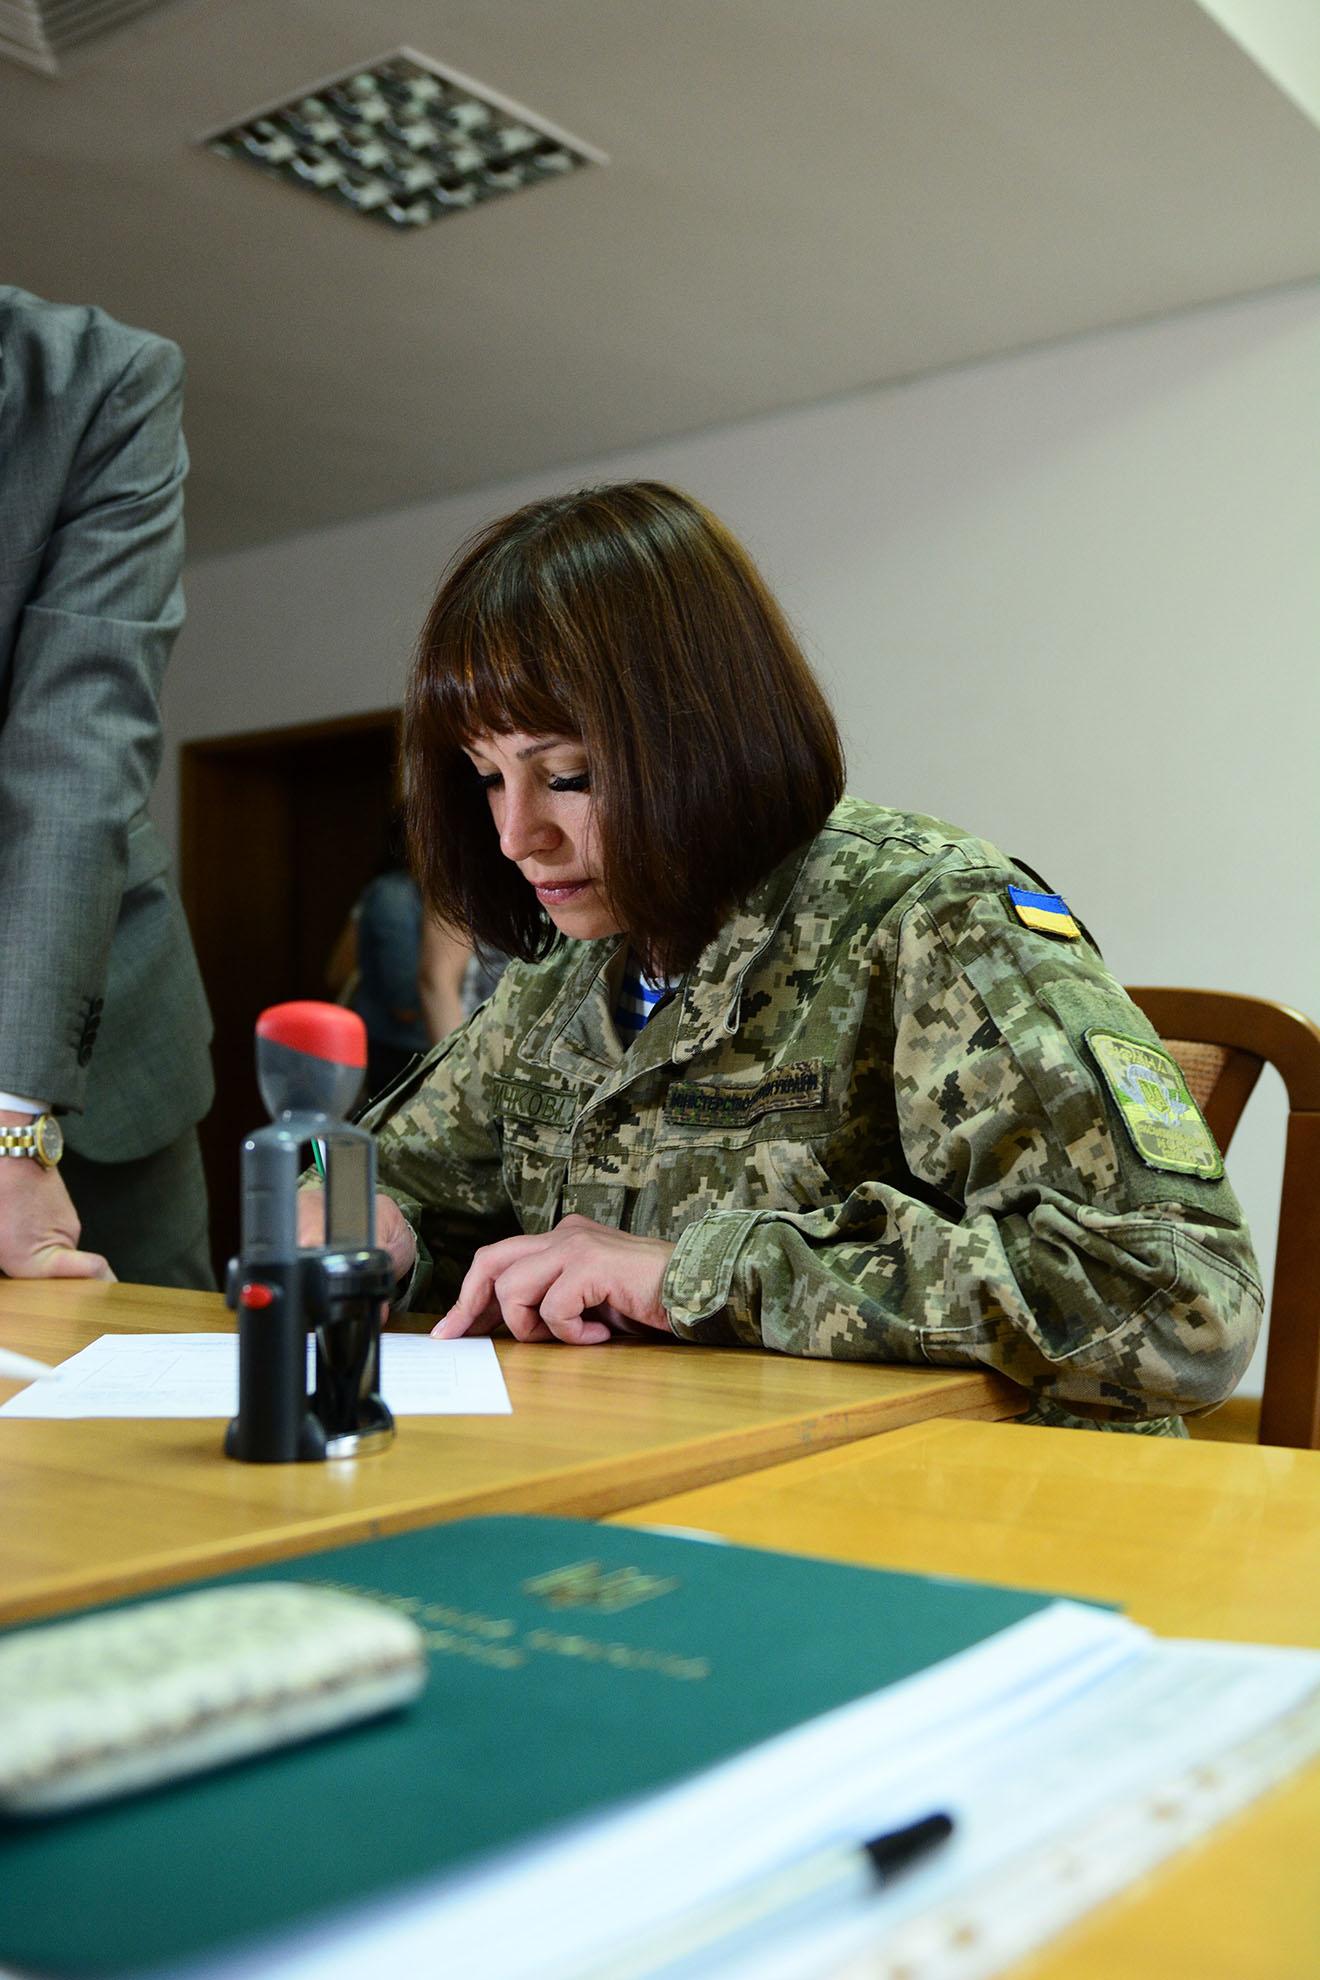 Тетяна Ричкова подала документи на реєстрацію в ЦВК - фото 1